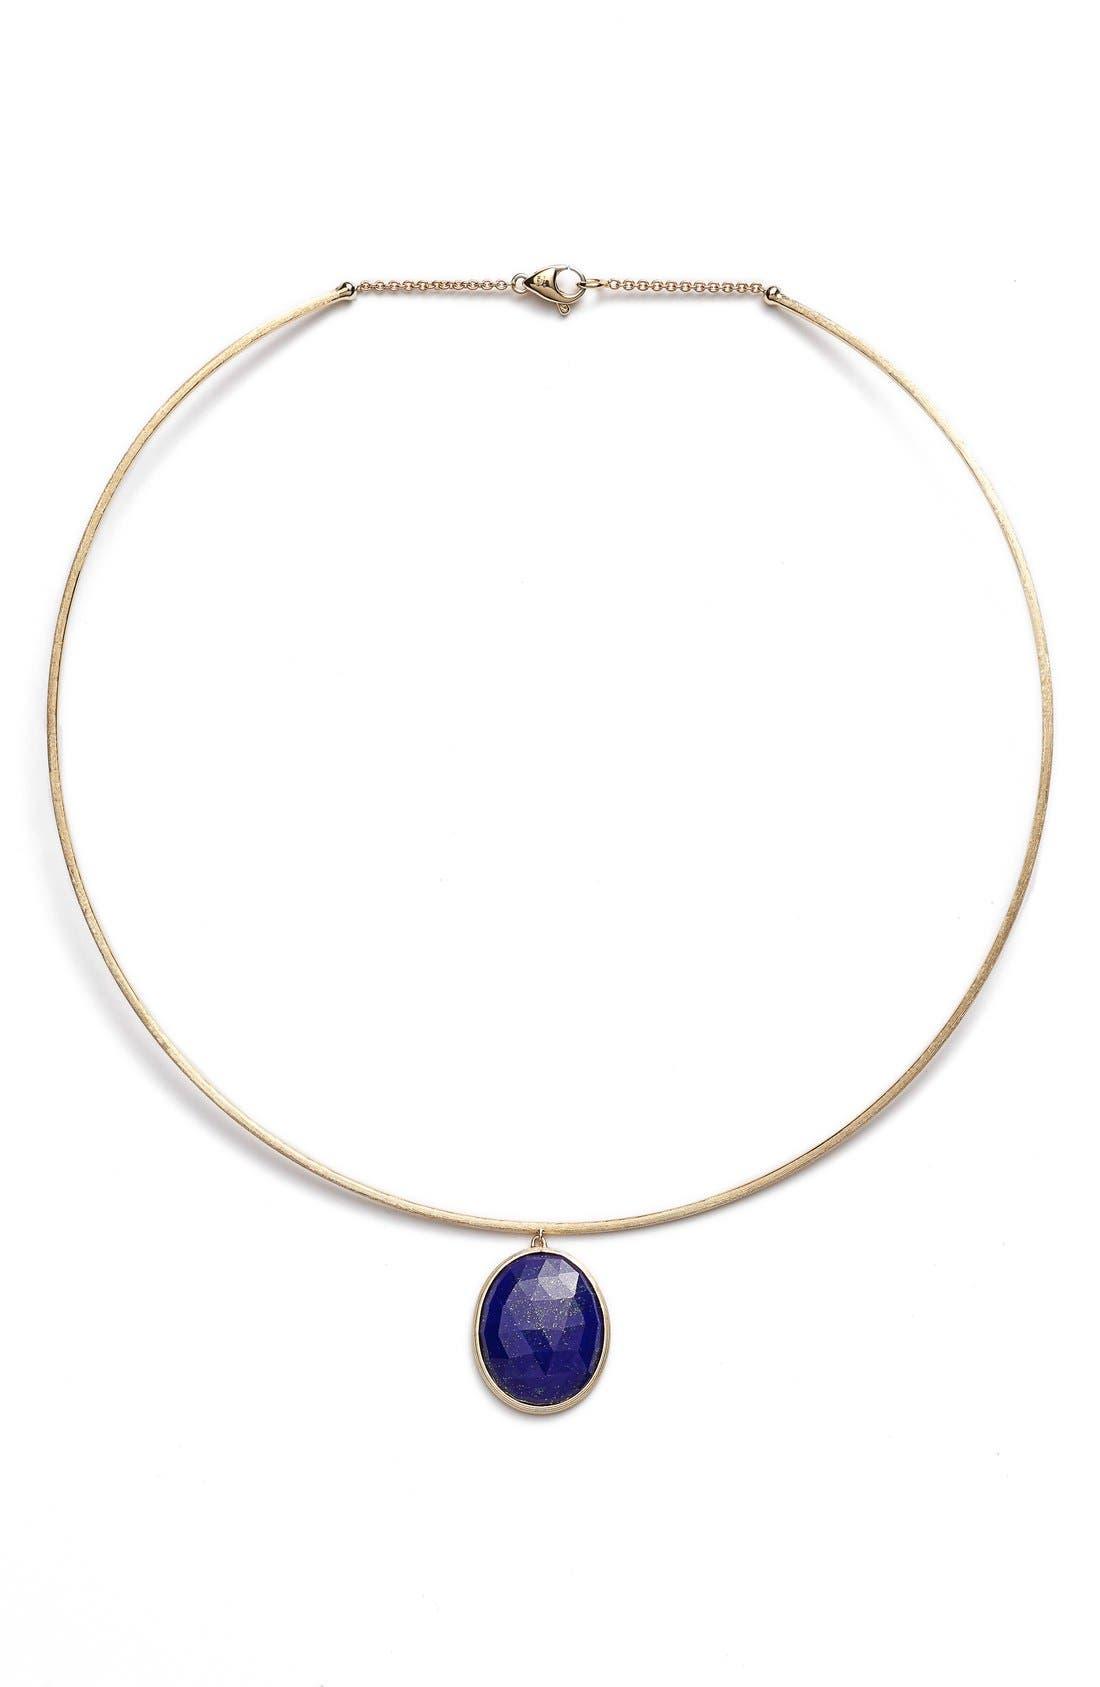 Marco Bicego 'Lunaria' Lapis Collar Necklace